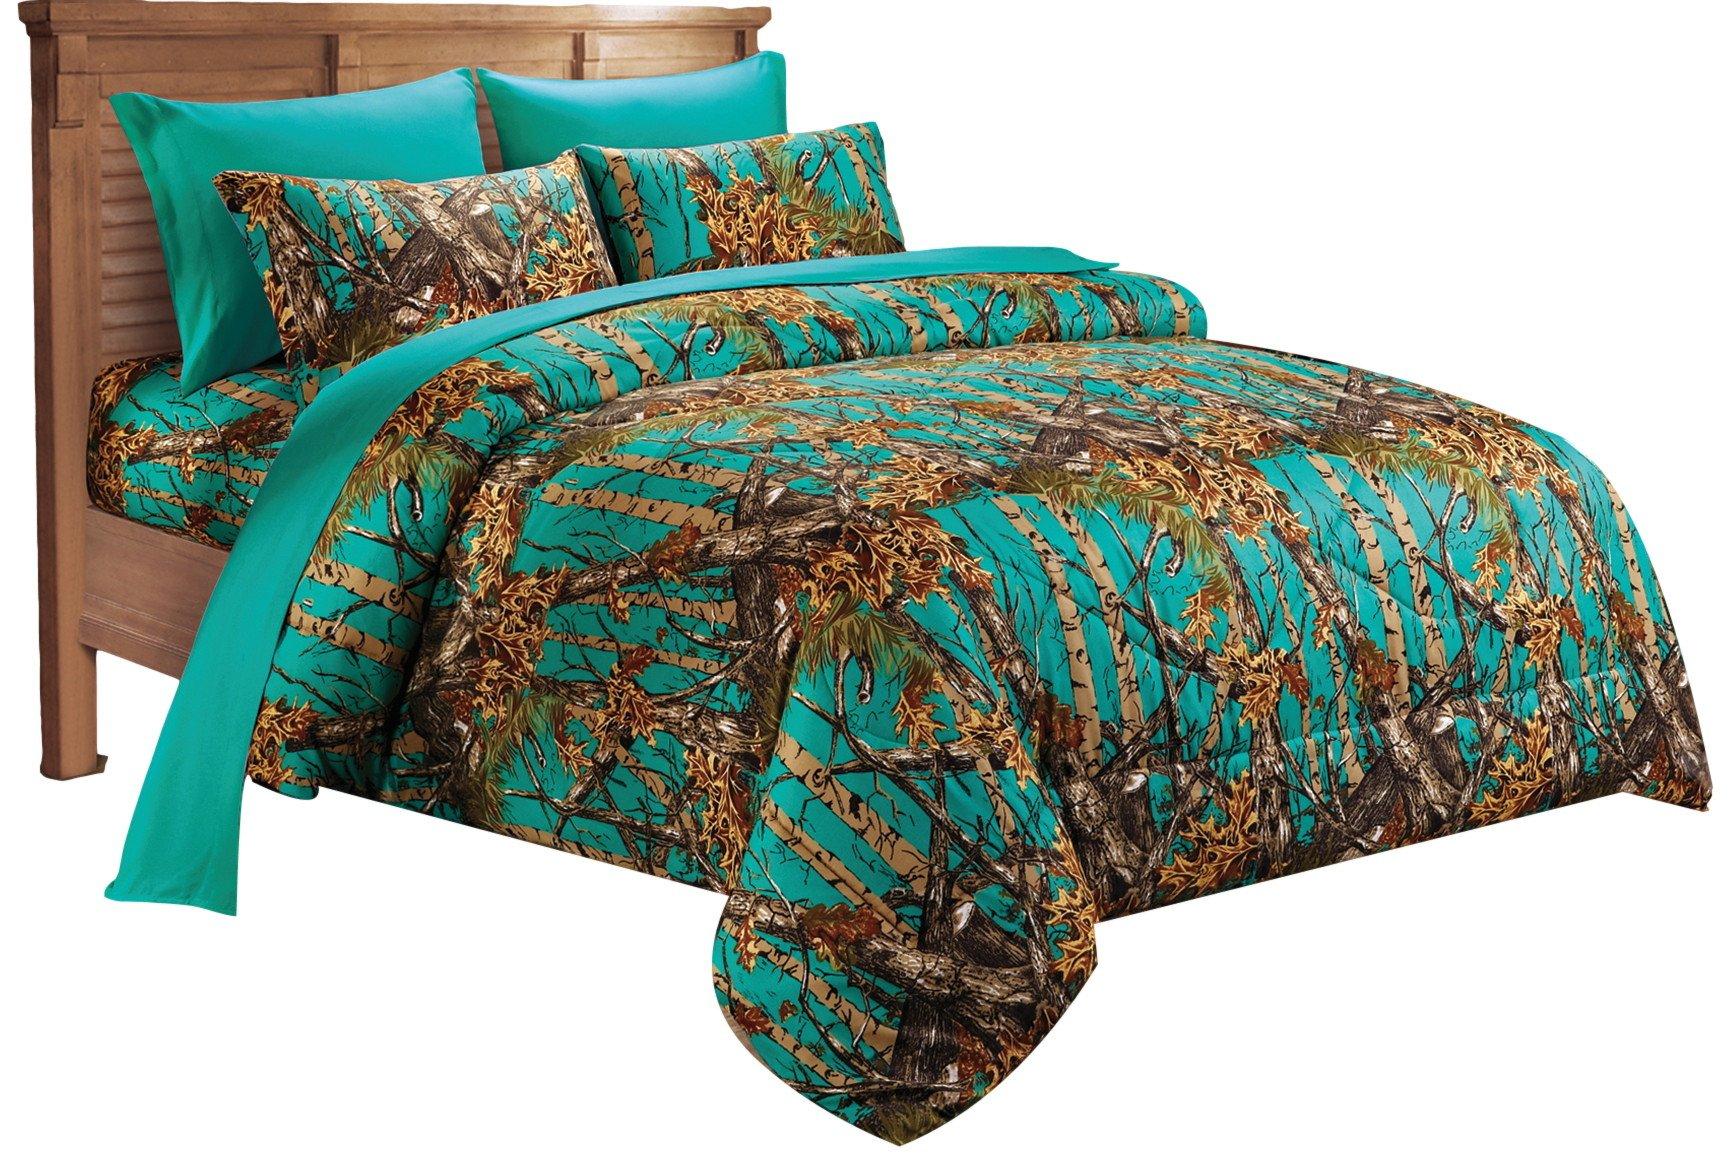 20 Lakes Super Soft Microfiber Camo Comforter Spread (Twin, Teal)